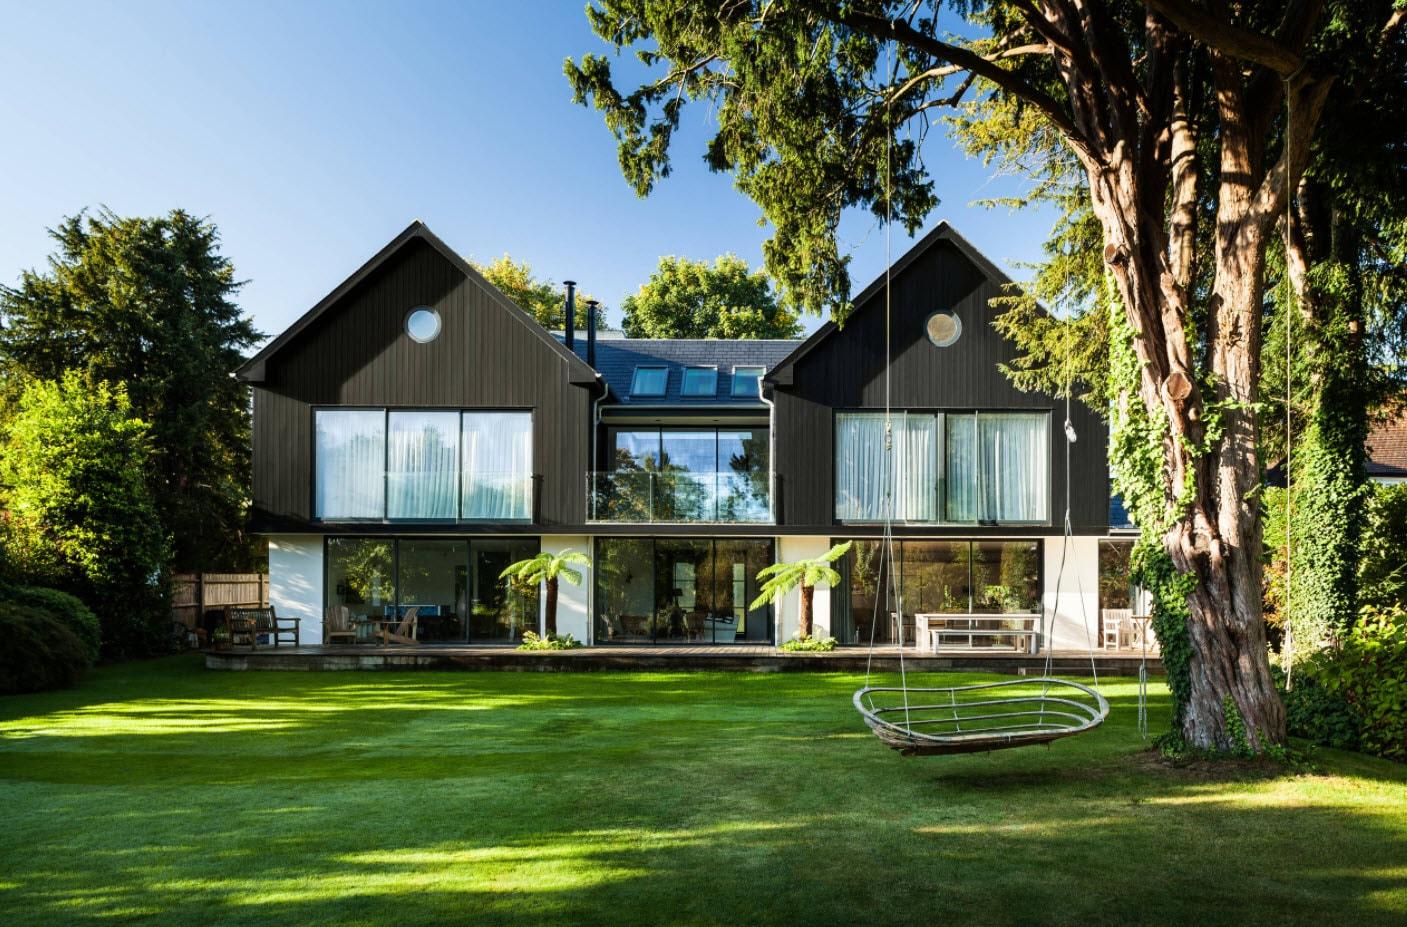 двухскатные мансардные крыши